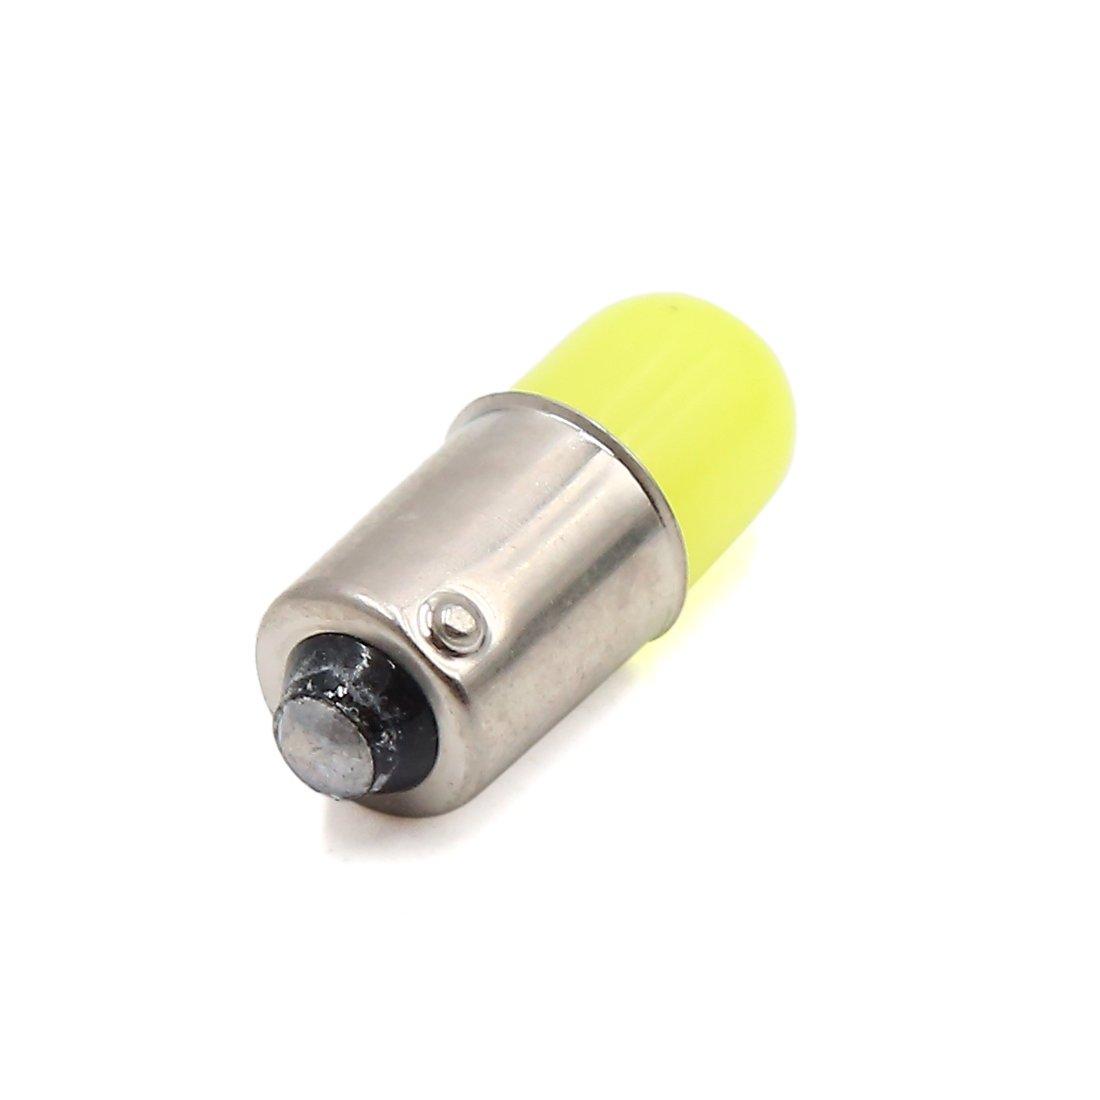 sourcing map 5pcs 12V BA9S Bombillas LED Blanco Luces para Panel Tablero Interior de Auto Coche